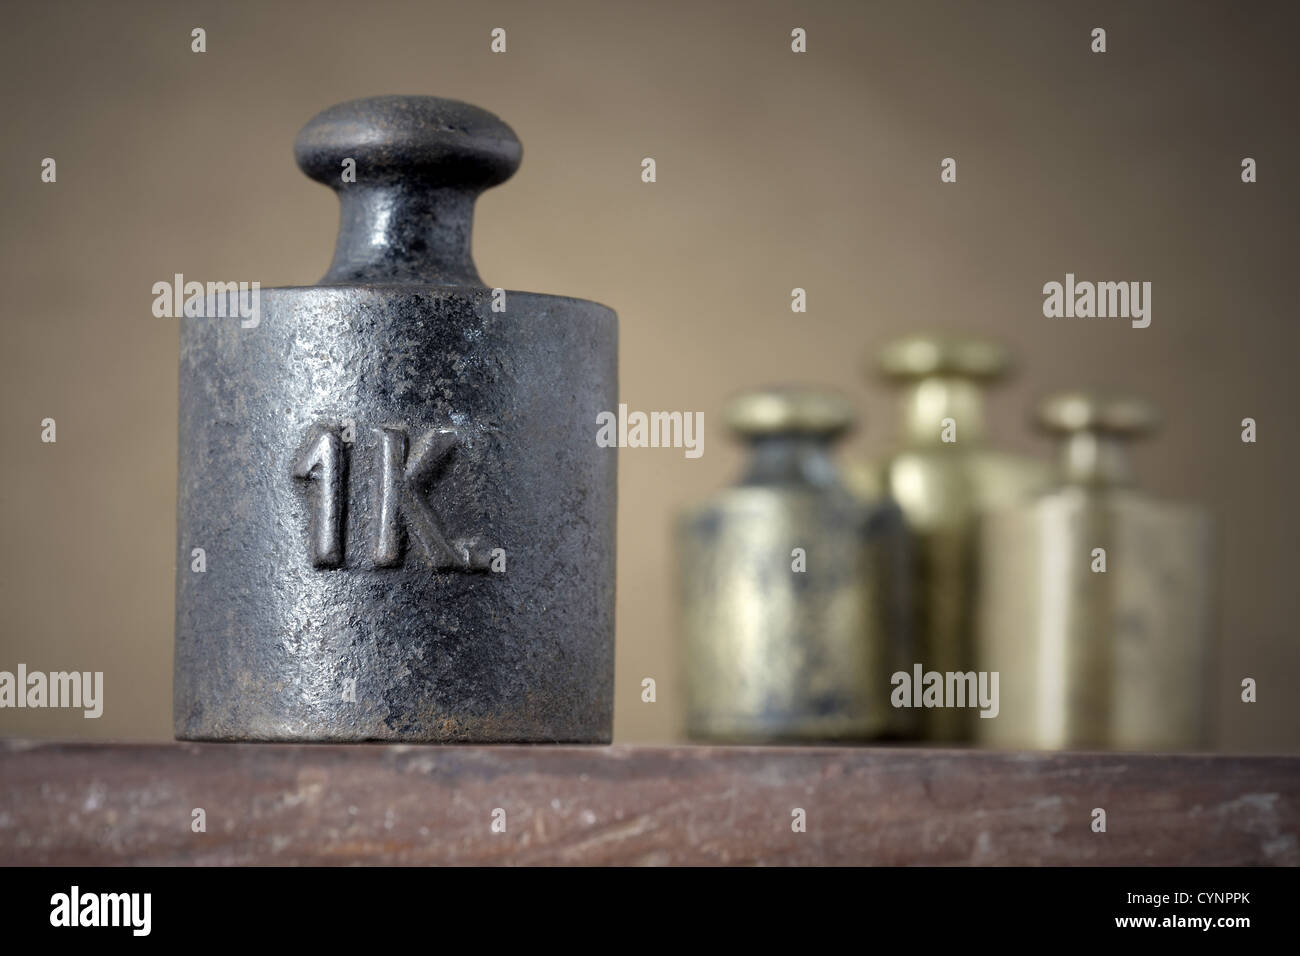 Vintage 1 kilogram calibration iron weight - Stock Image